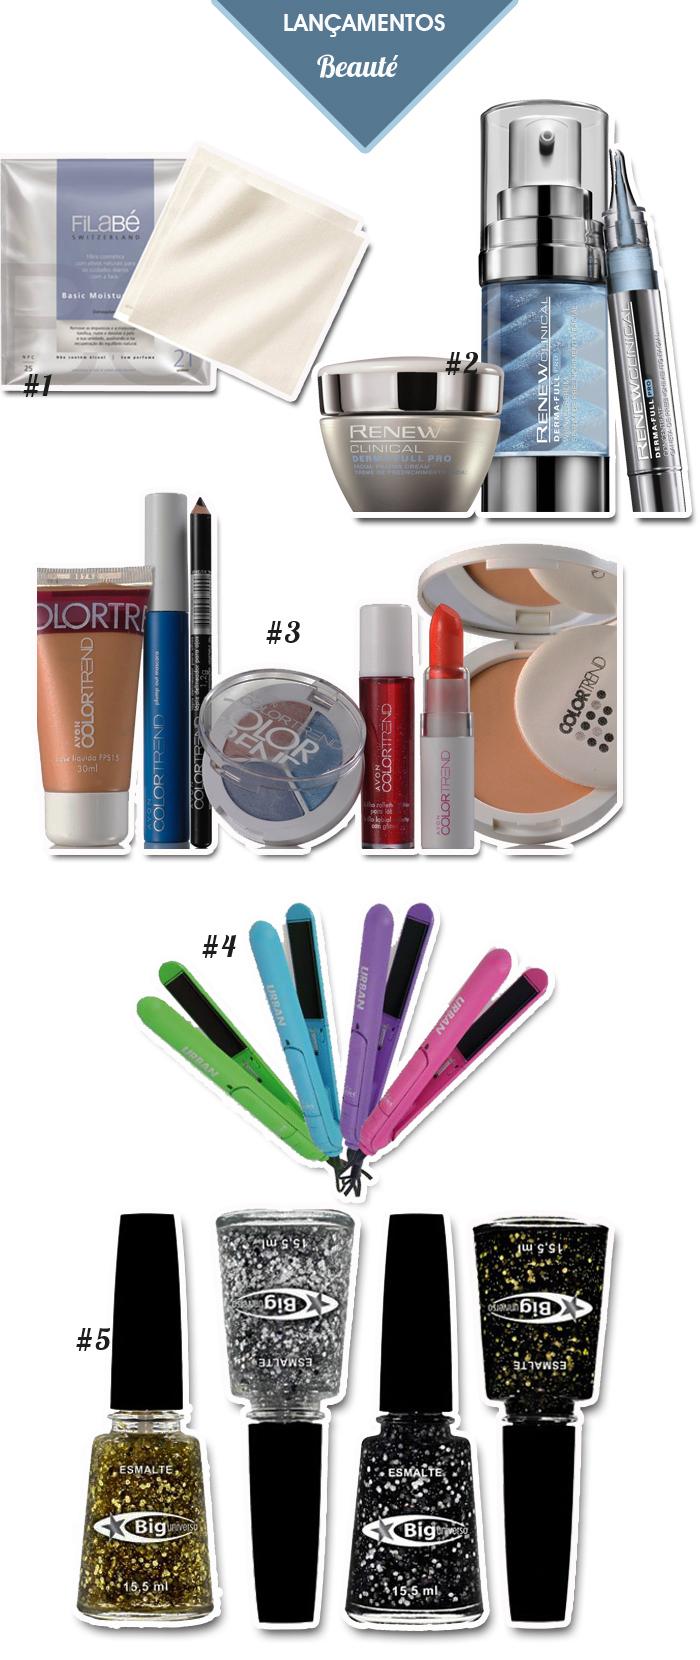 lançamentos de produtos de beleza | GA.MA Italy | Esmalte Big Universo | Maquiagens Avon Color Trend | Avon Renew | Blog MeninaIT